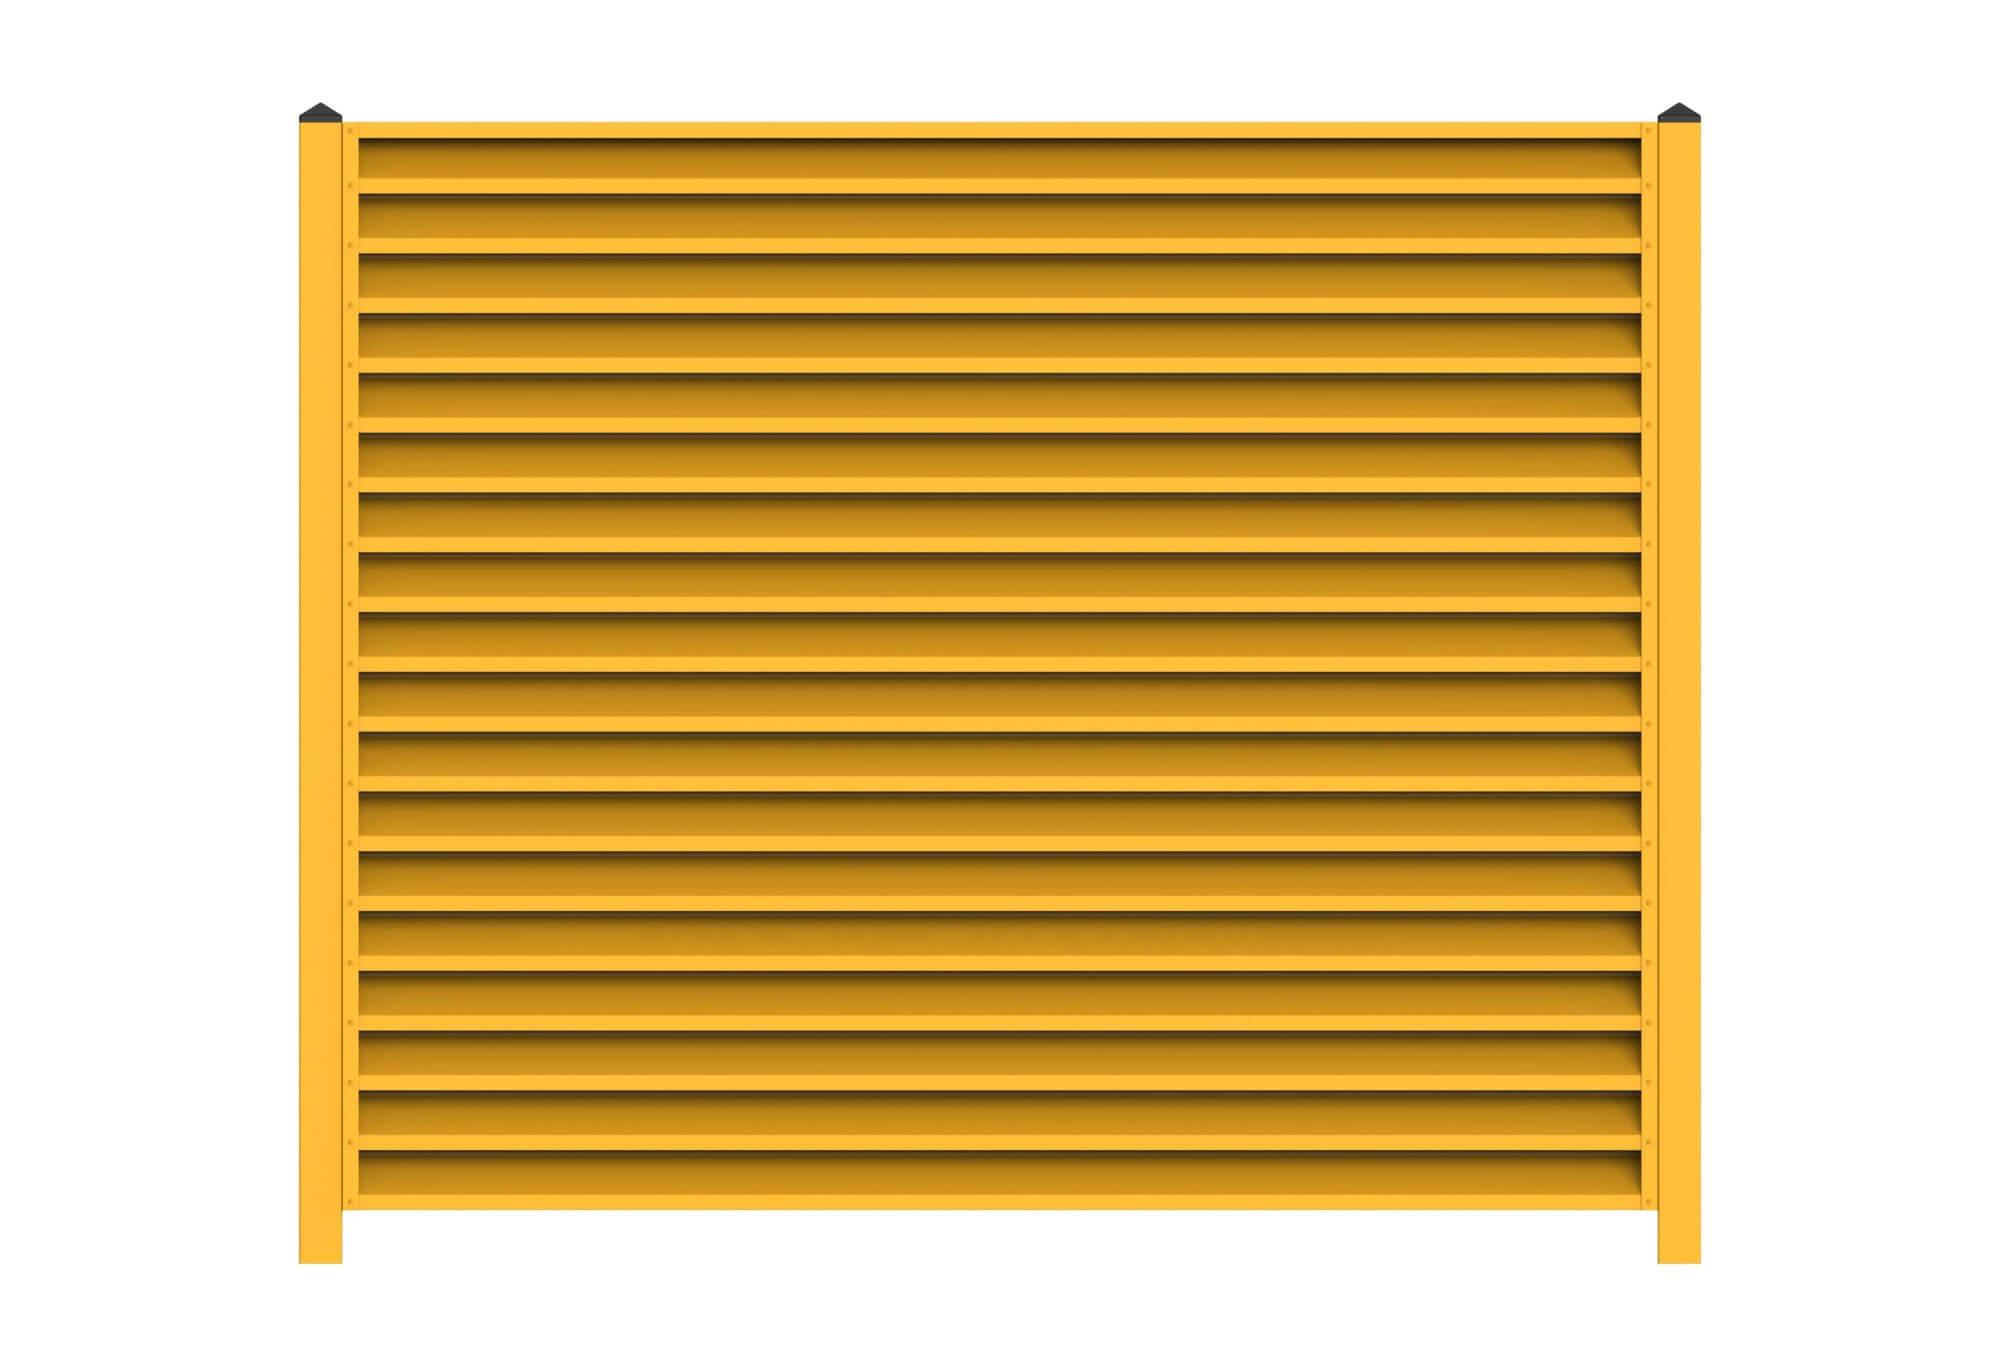 Забор-жалюзи цвета жёлтый цинк